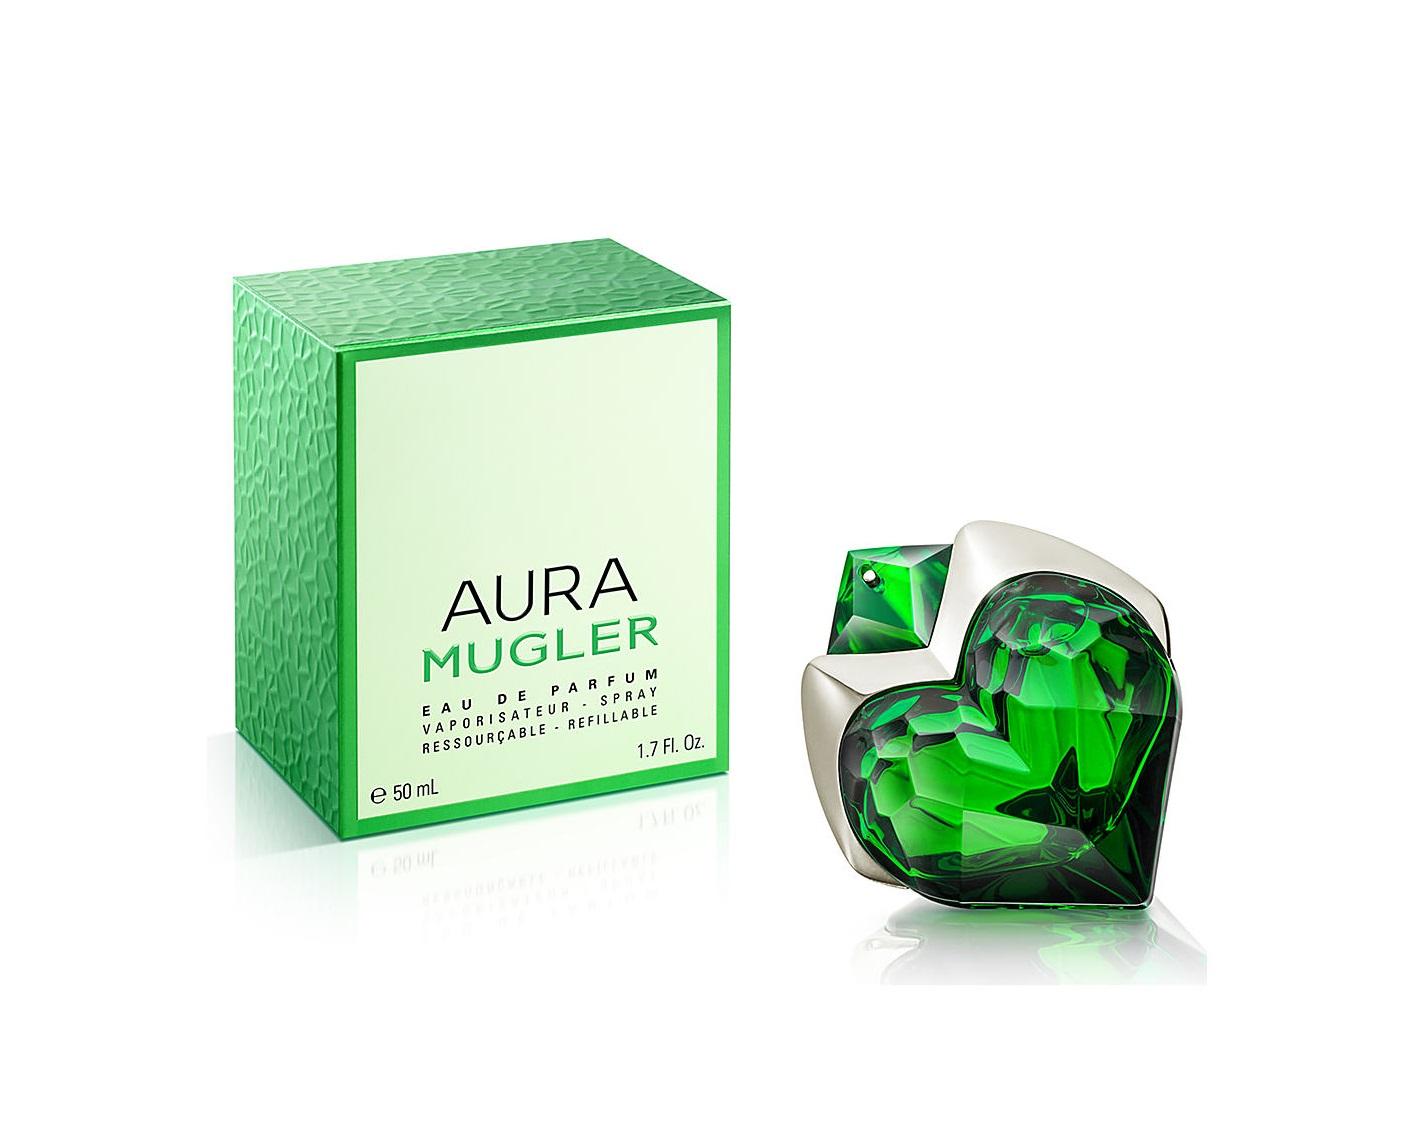 Aura Mugler by Thierry Mugler profumi di nicchia 2018